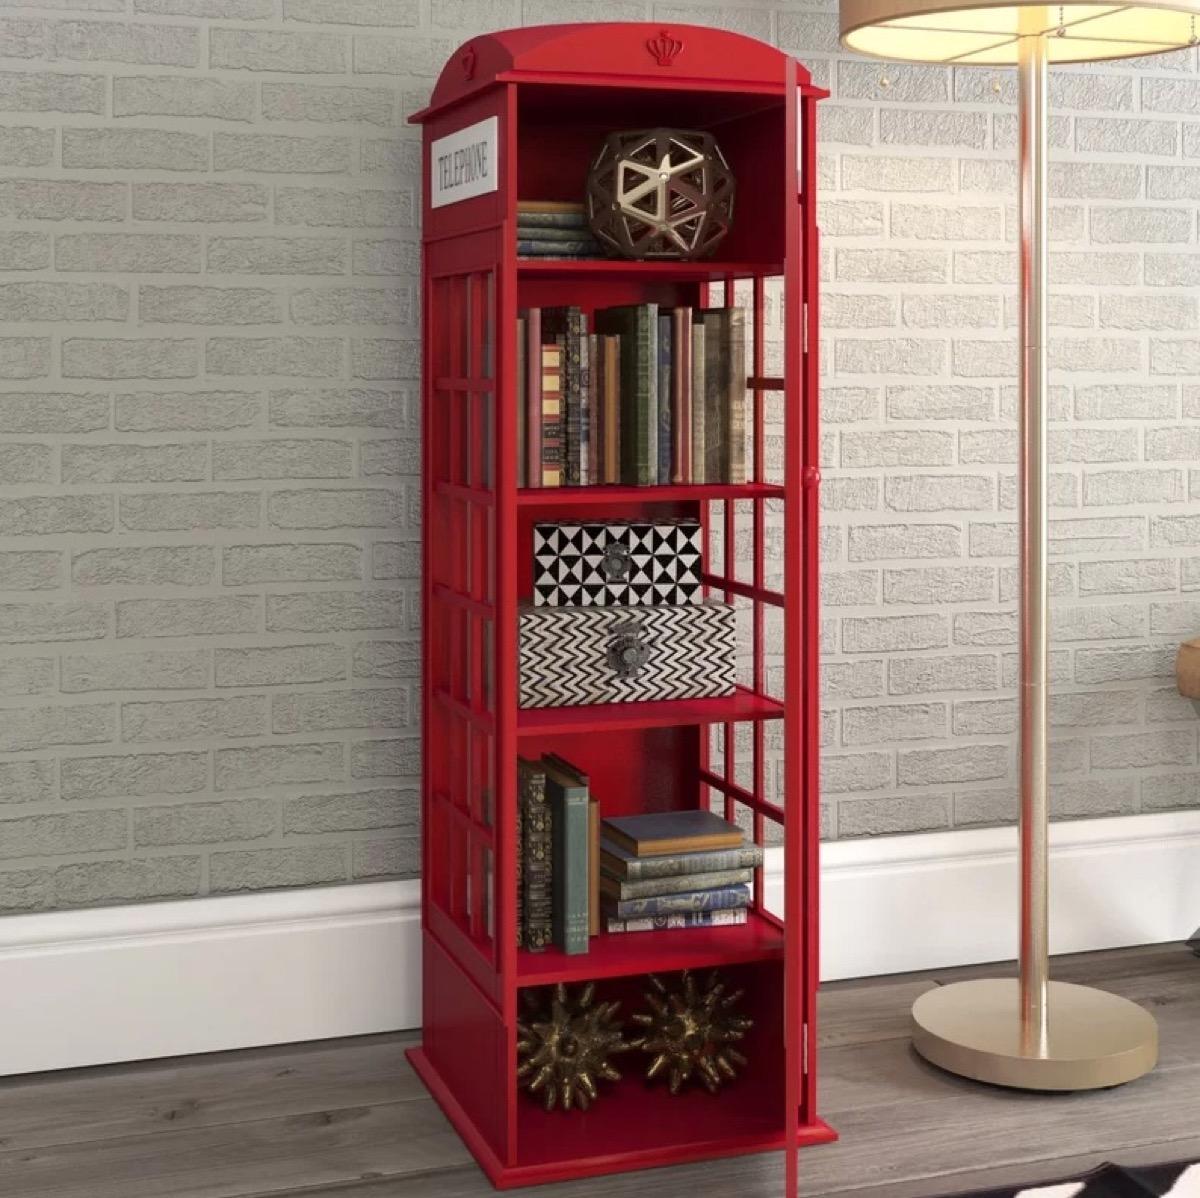 Wayfair Phone Booth Bookshelf Storage Furniture